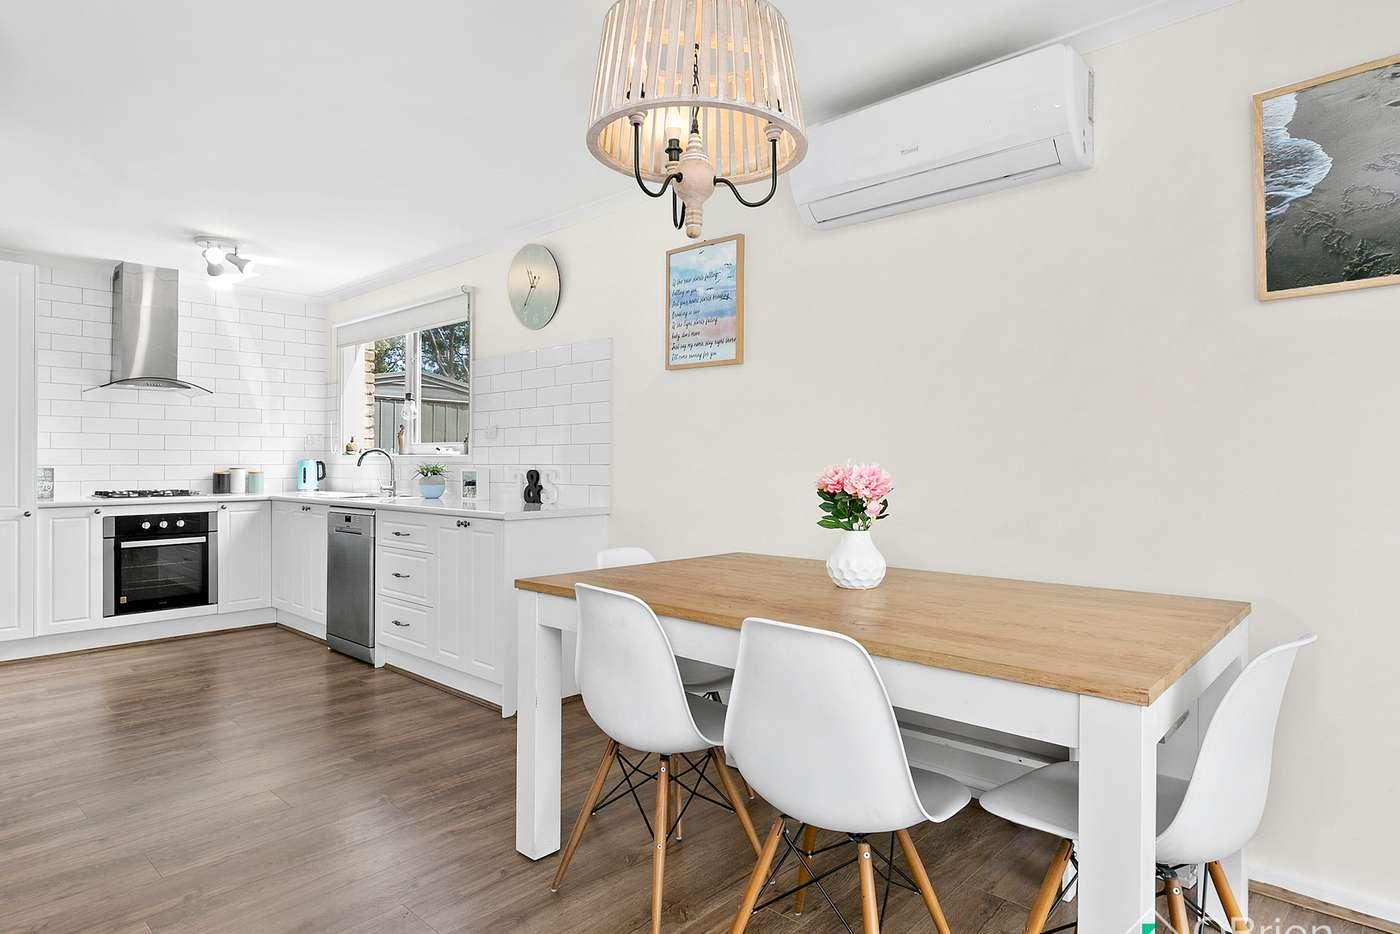 Main view of Homely house listing, 53 Carramar Street, Mornington VIC 3931